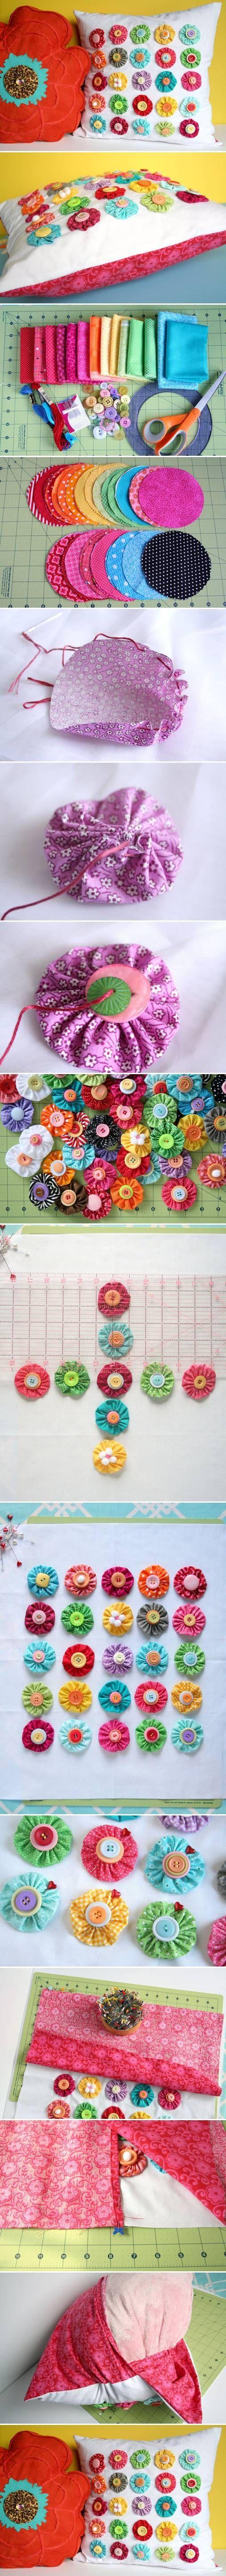 DIY Fabric Decorative Flowers Click www.faveed.com for more craft ideas!